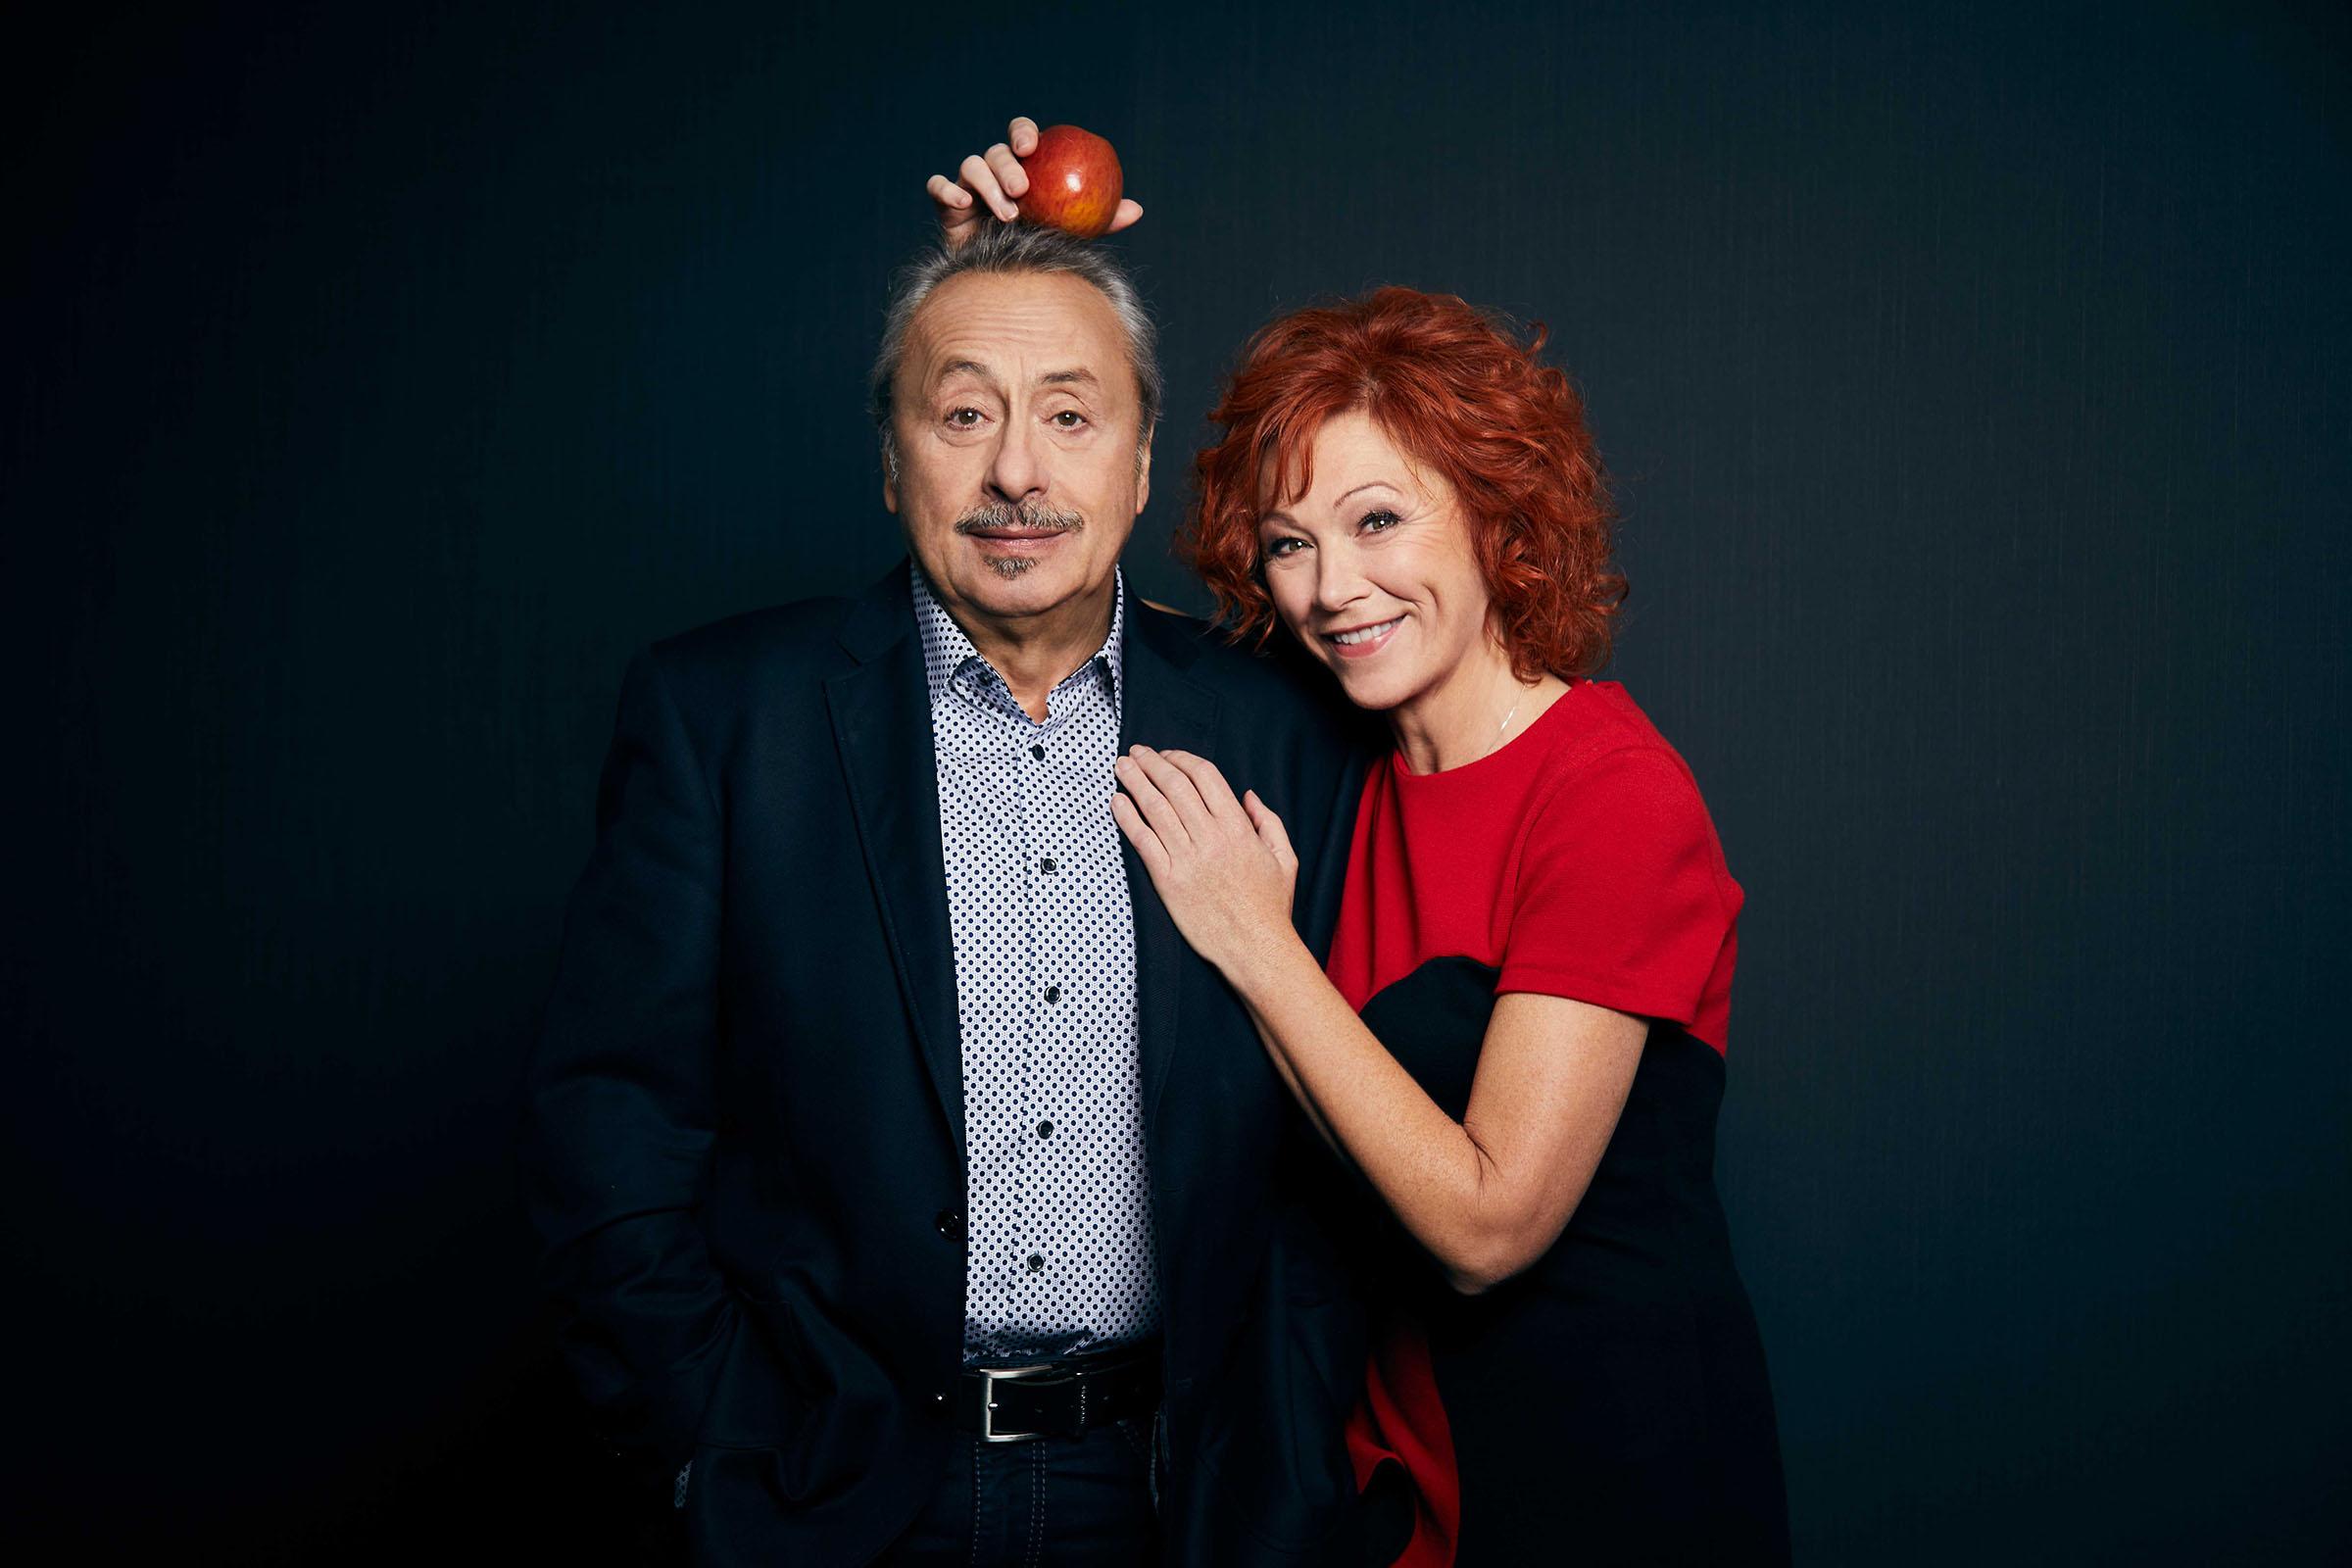 Wolfgang Stumph & Heike Trinker